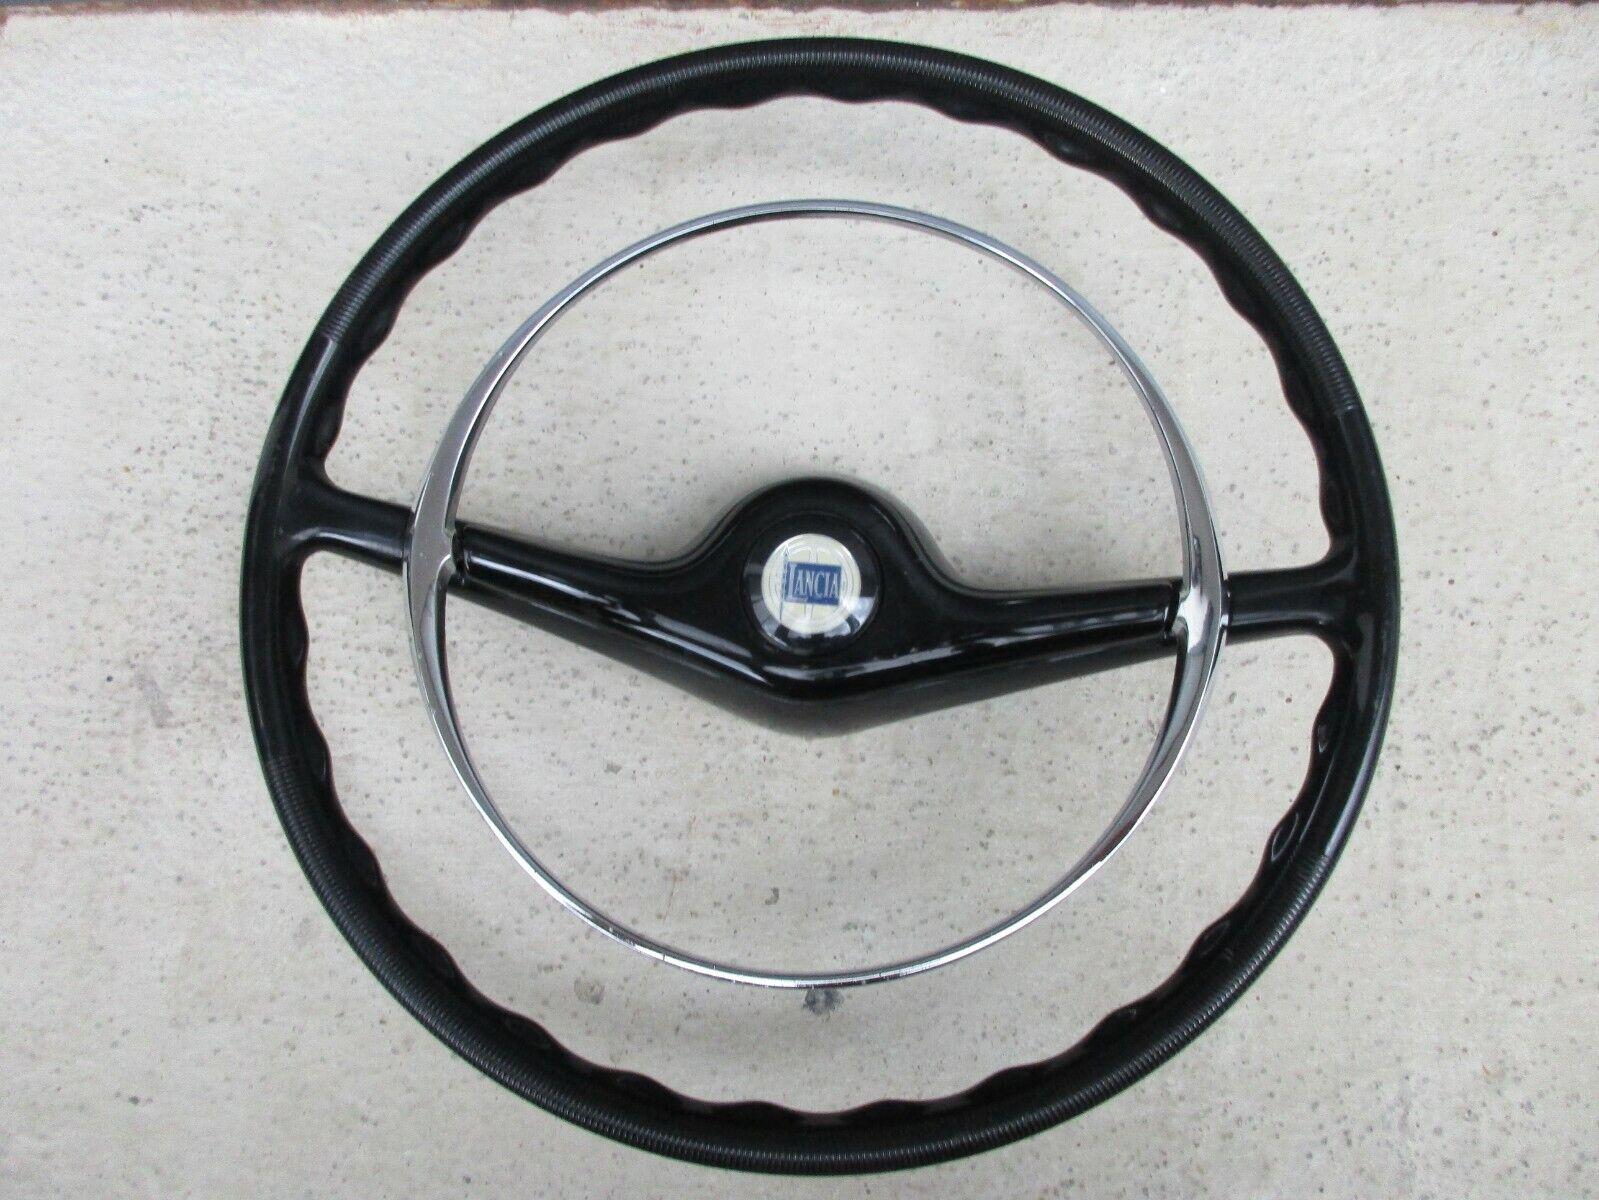 Lenkrad für Lancia fulvia berlin 2c GTE